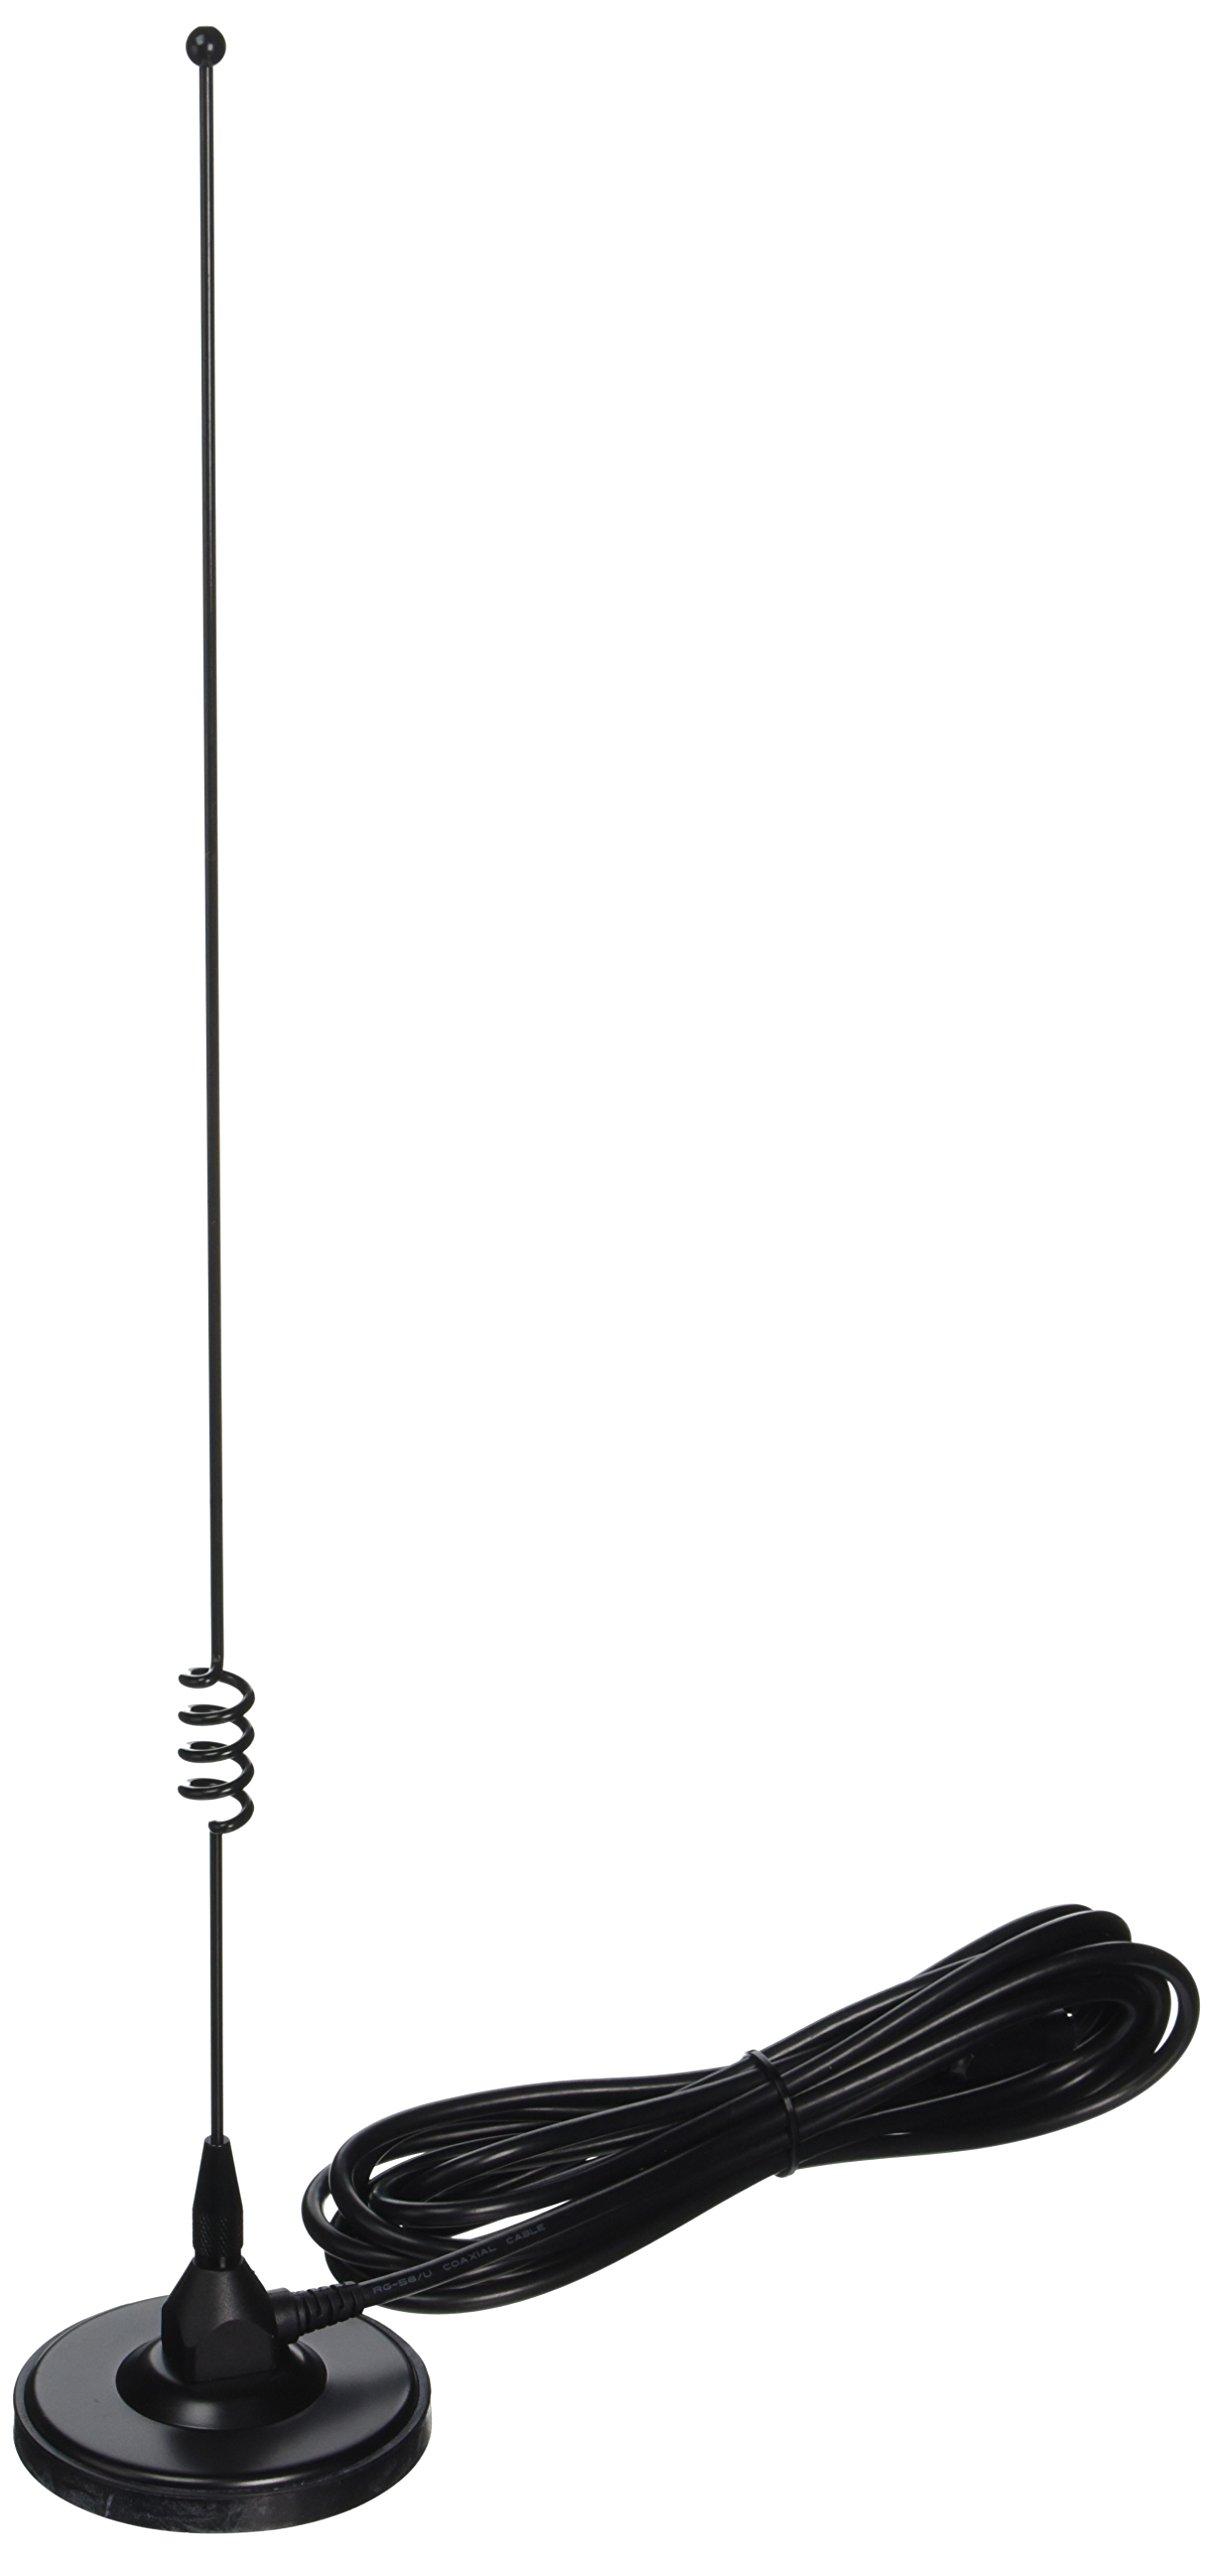 Garmin Magnetic mount antenna by Garmin